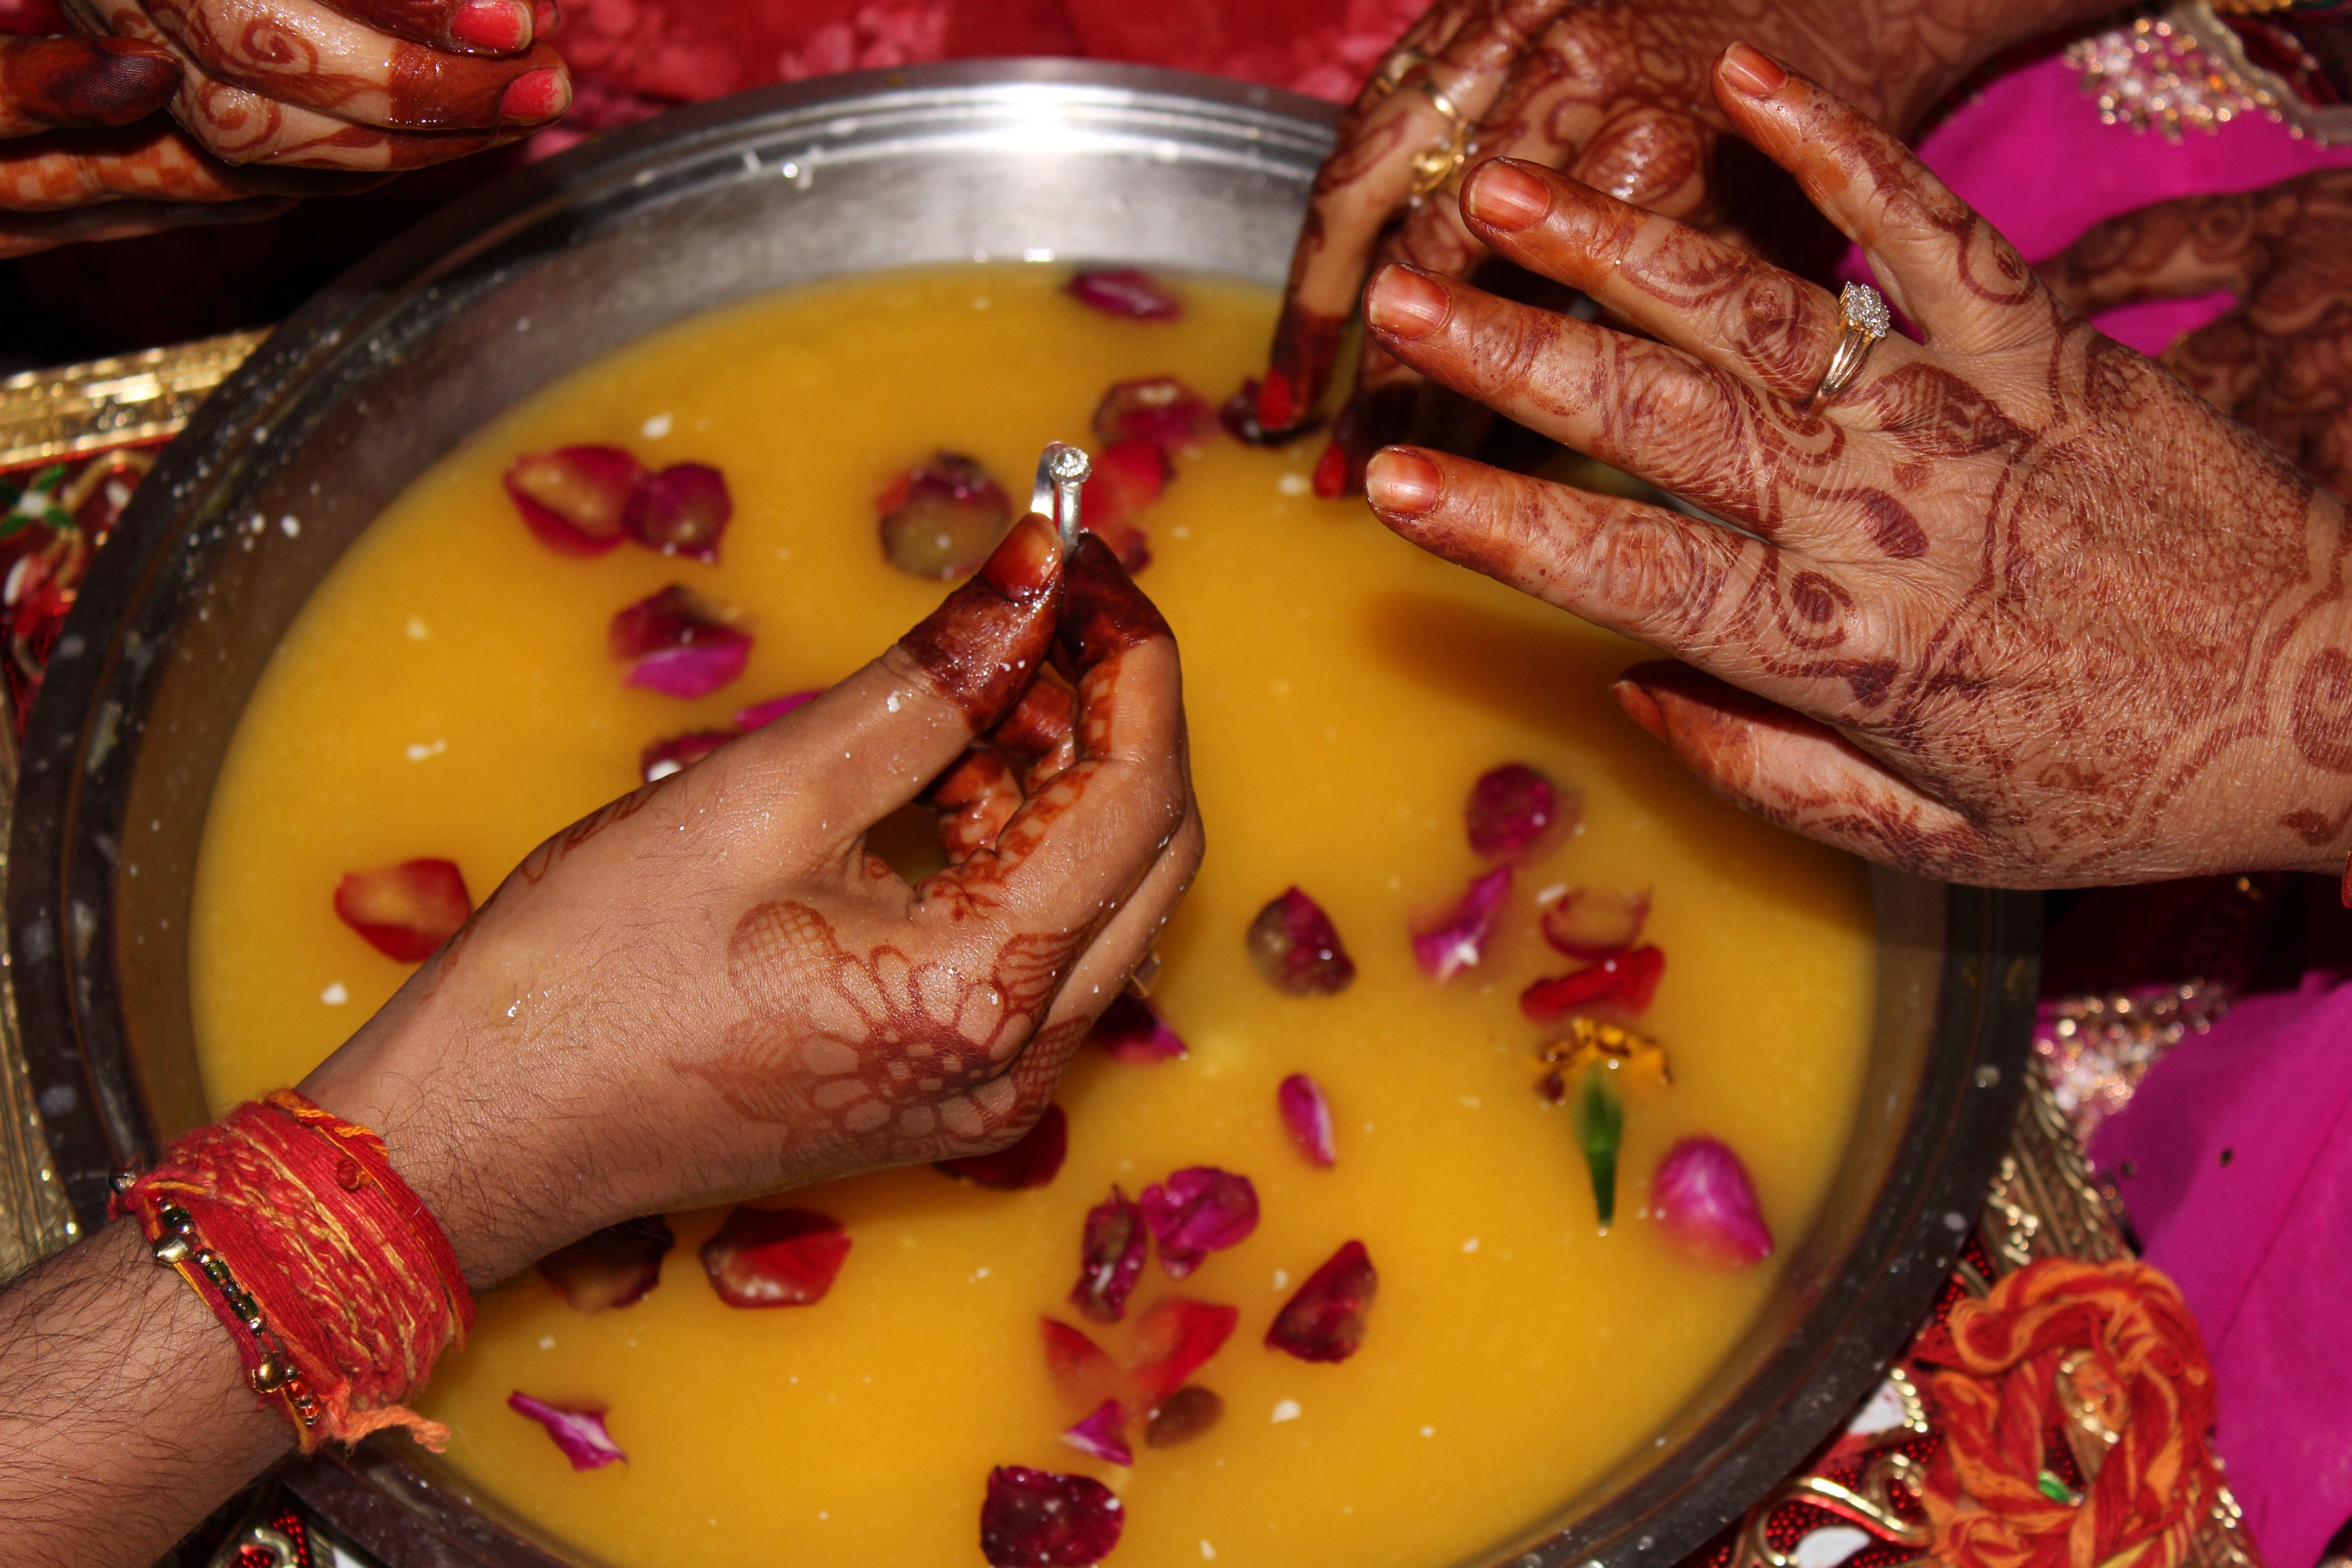 Fotos gratis : Fruta, plato, comida, Produce, vegetal, religión ...